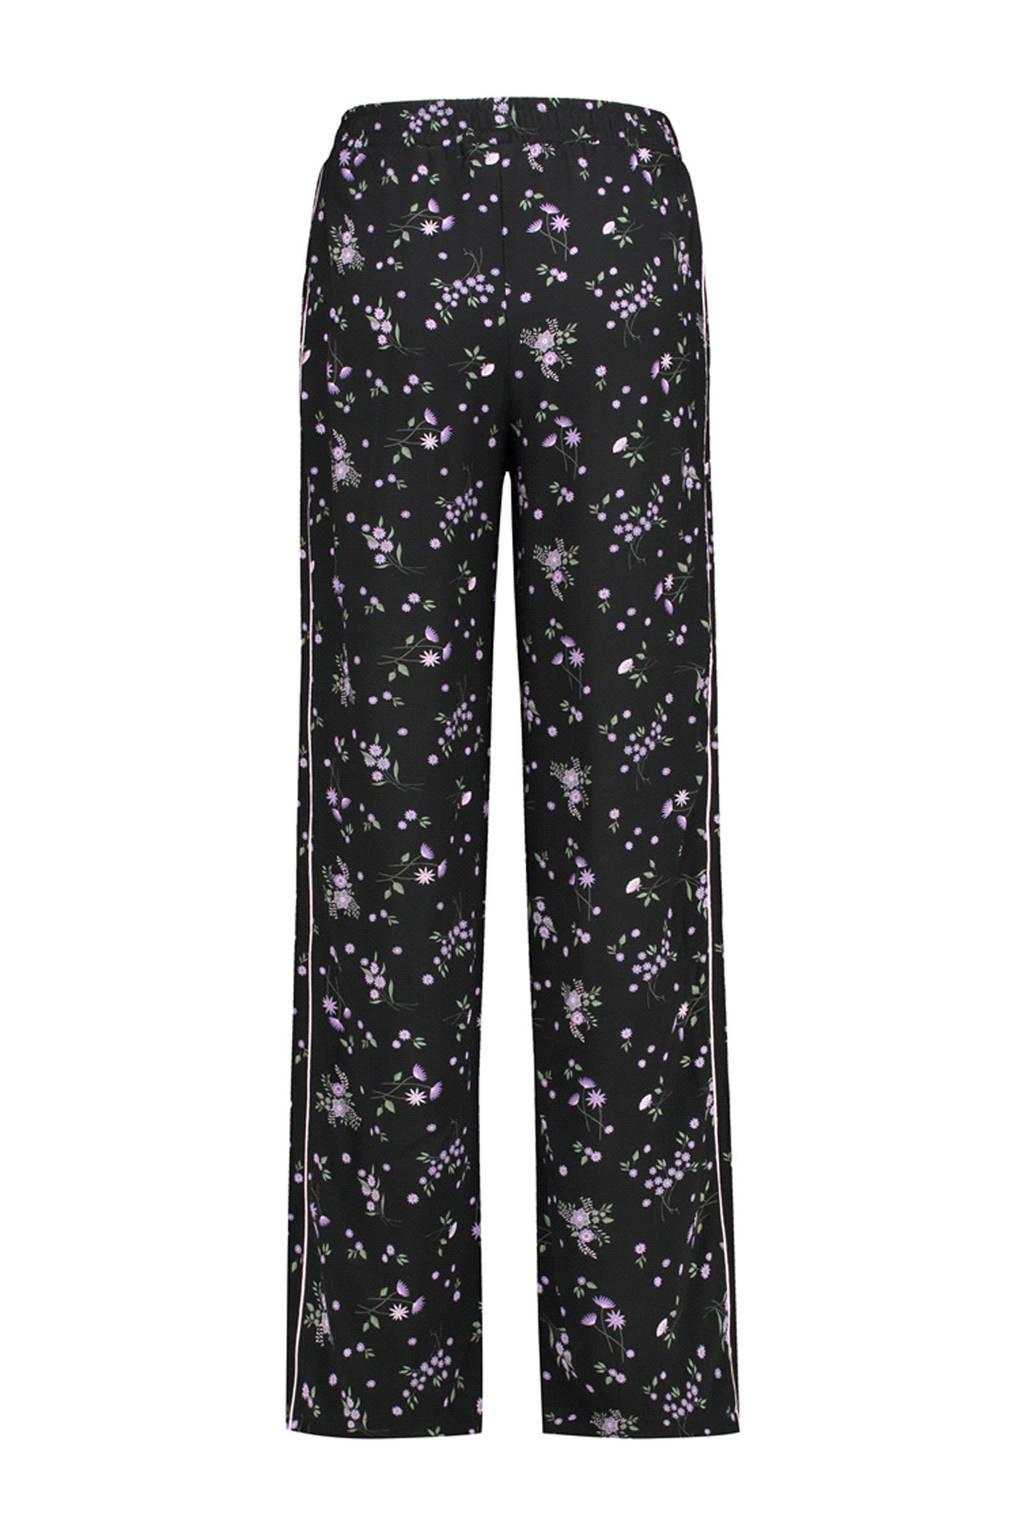 Catwalk Junkie gebloemde straight fit broek, Zwart/paars/groen